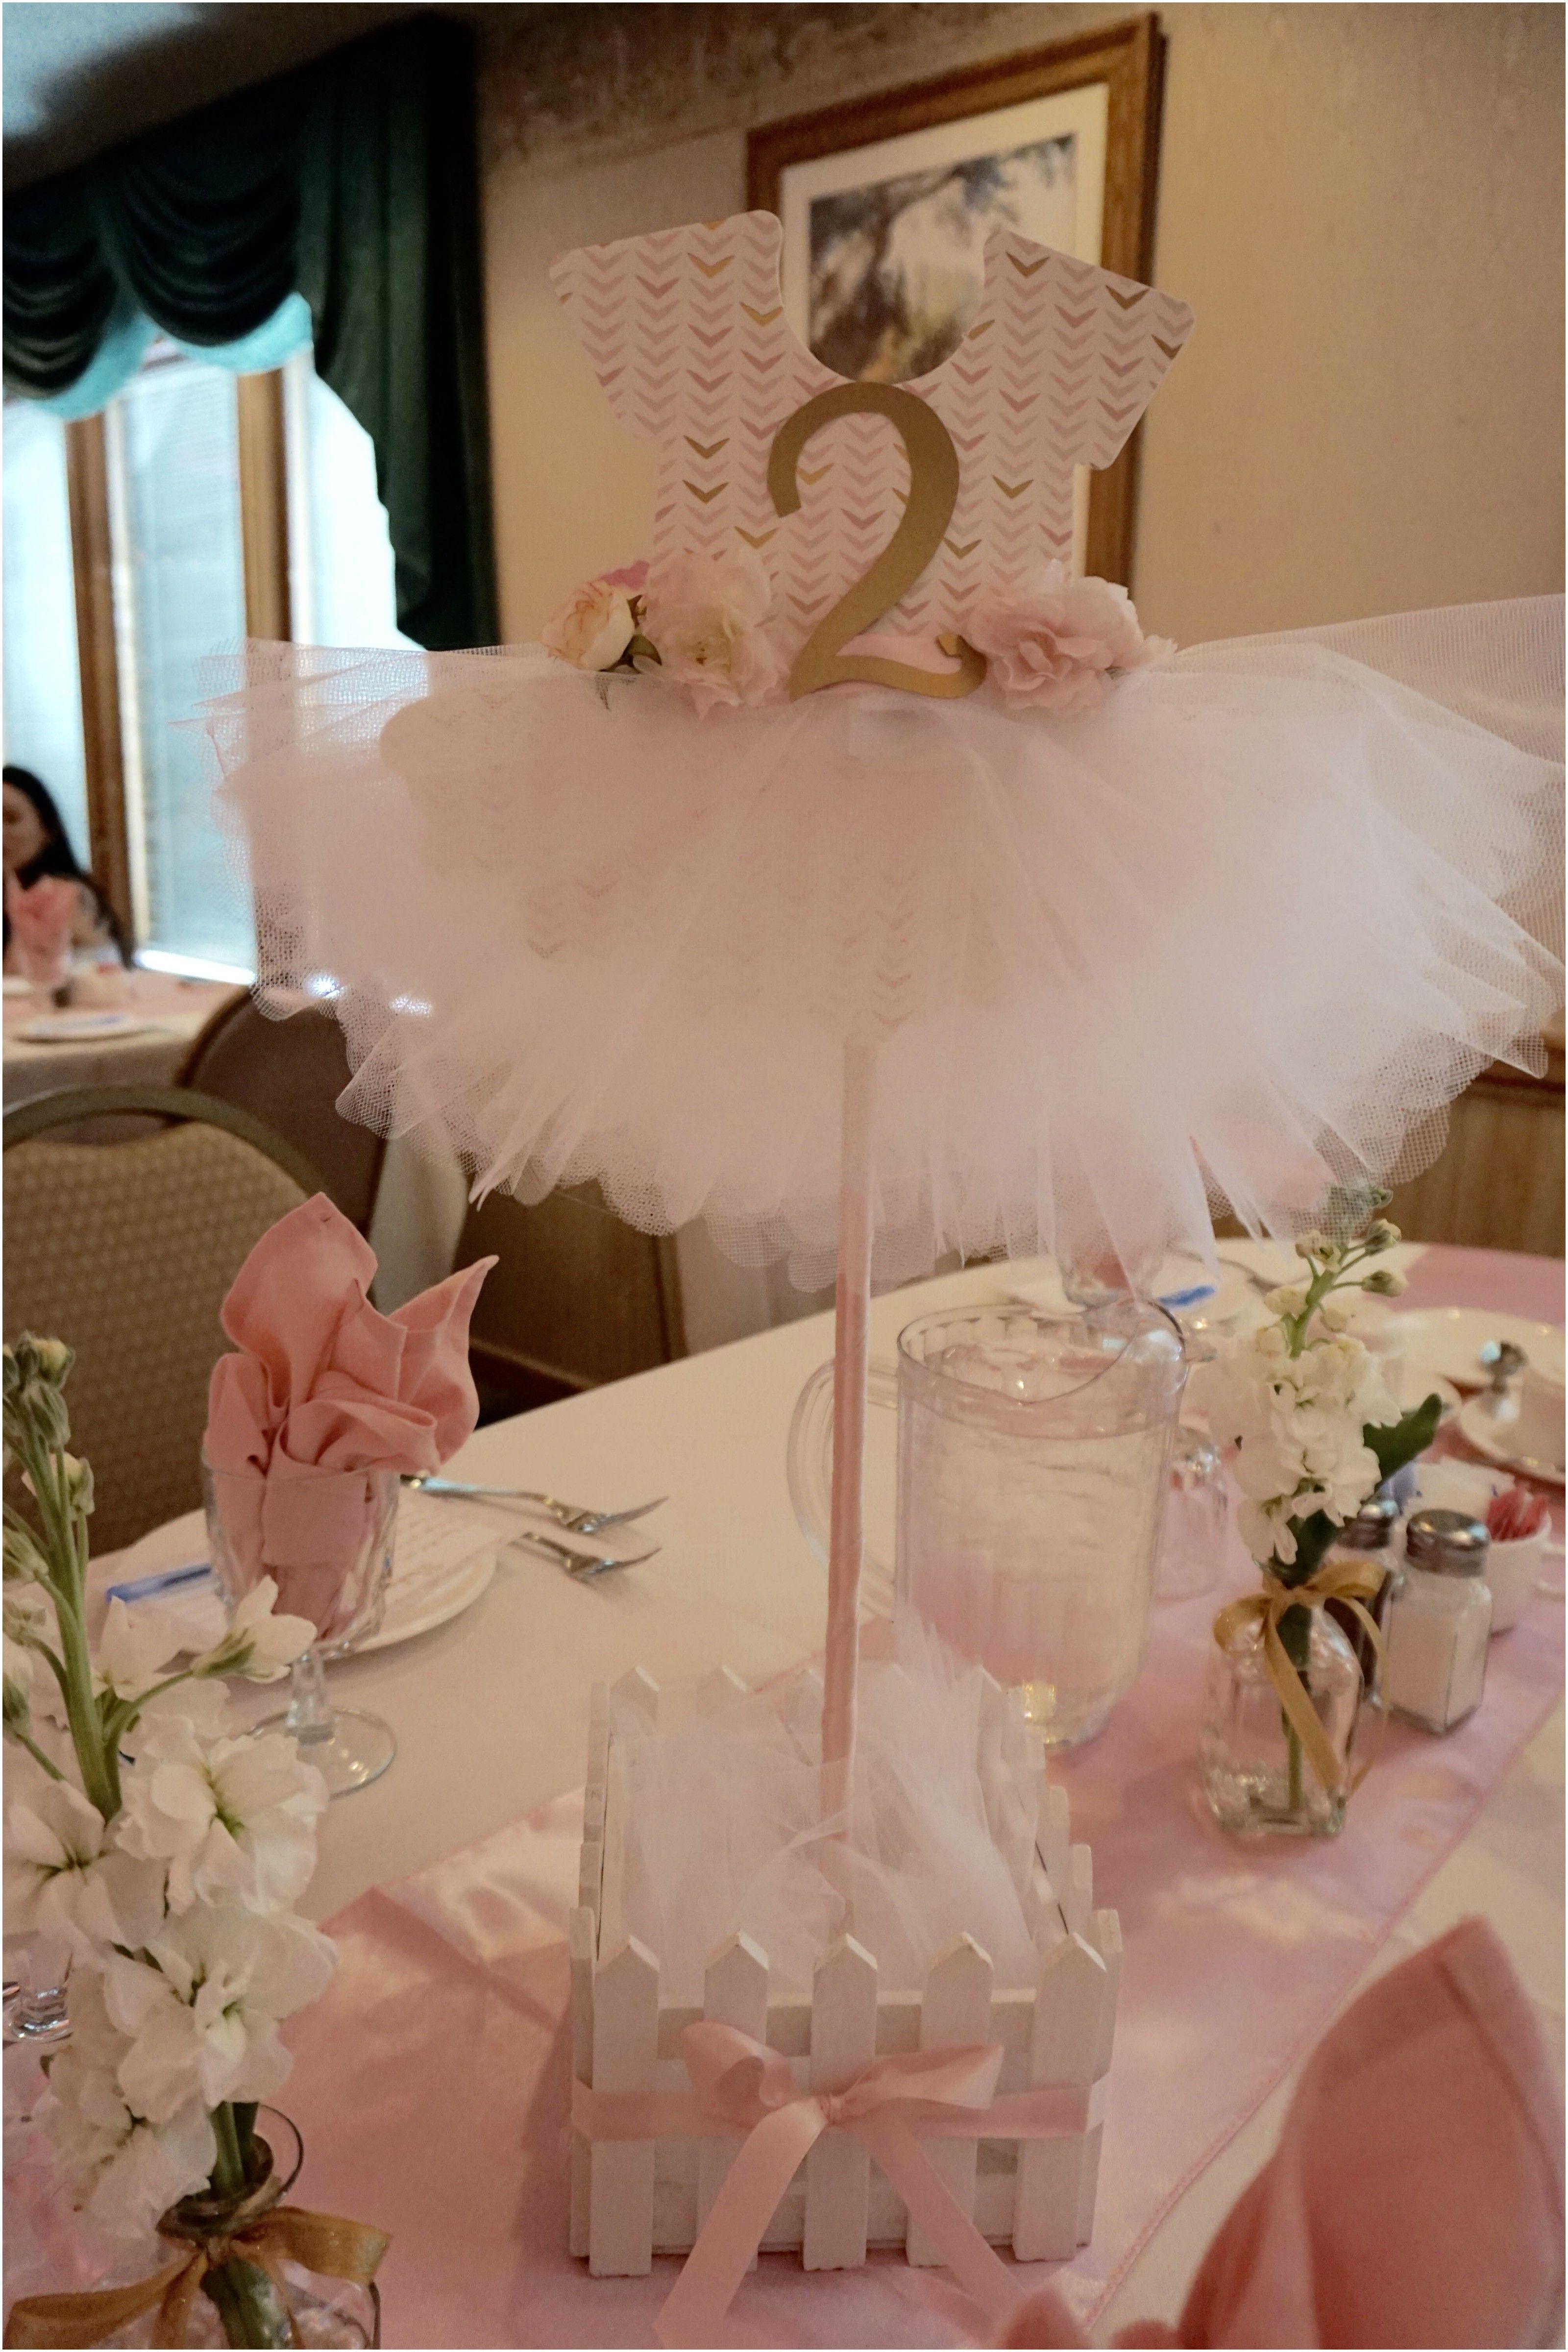 Luxury Baby Shower Decorations Kuwait  Ballerina baby showers